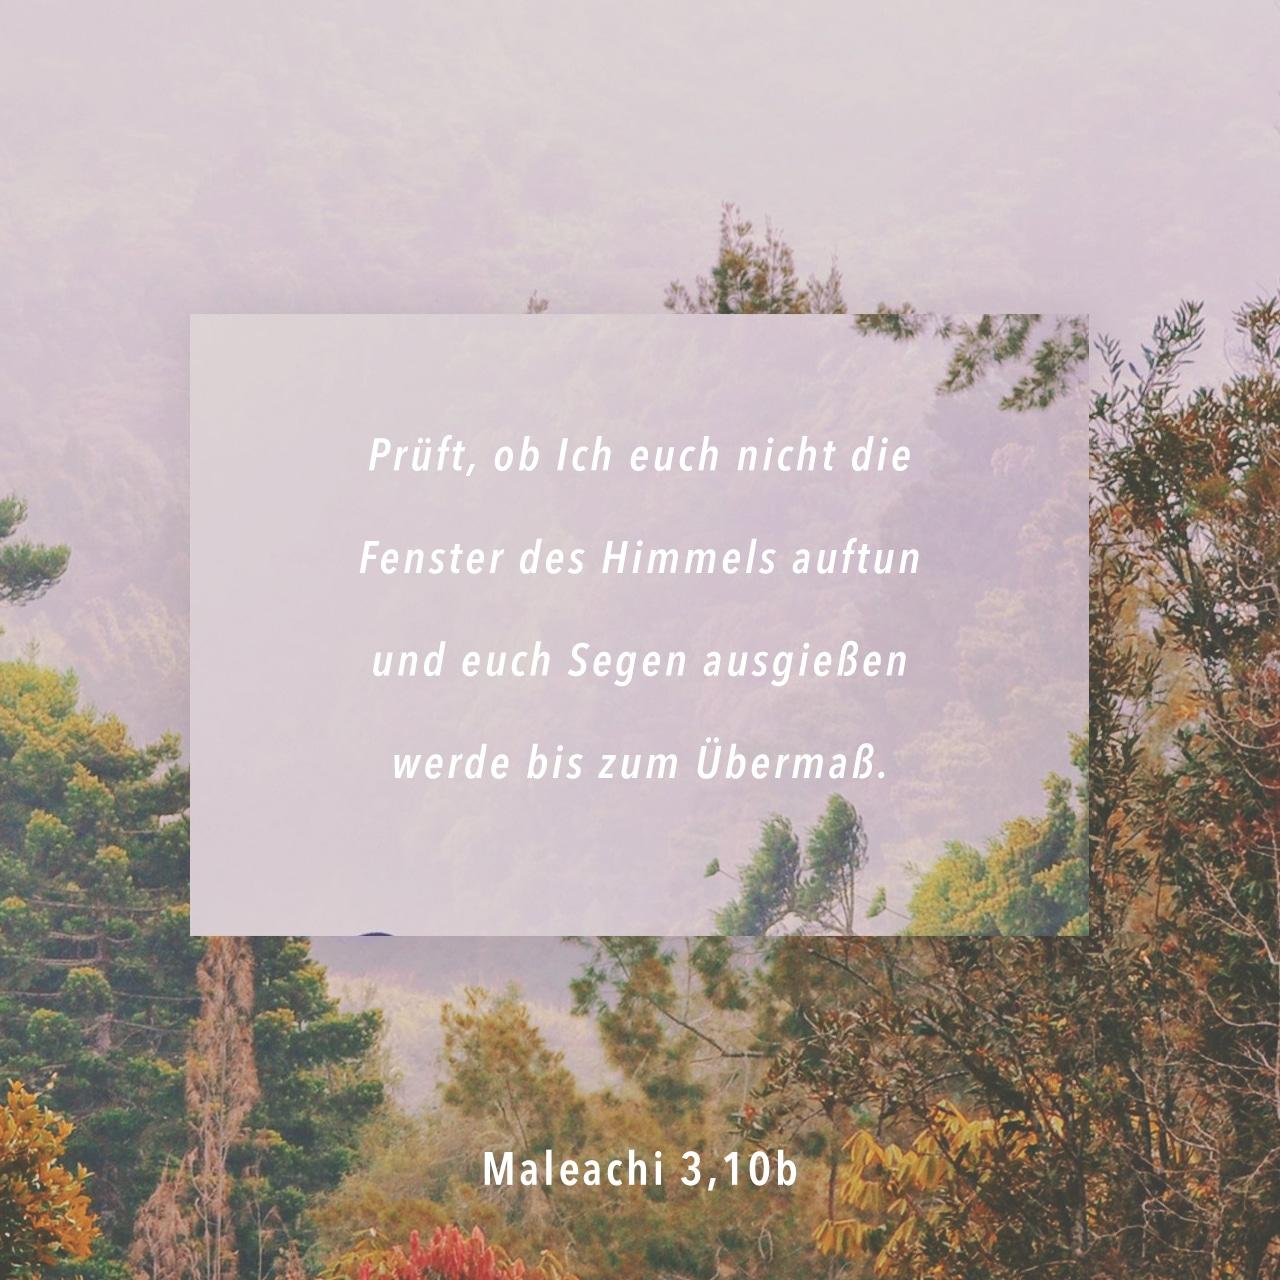 Malachi 3:10 (JPG)